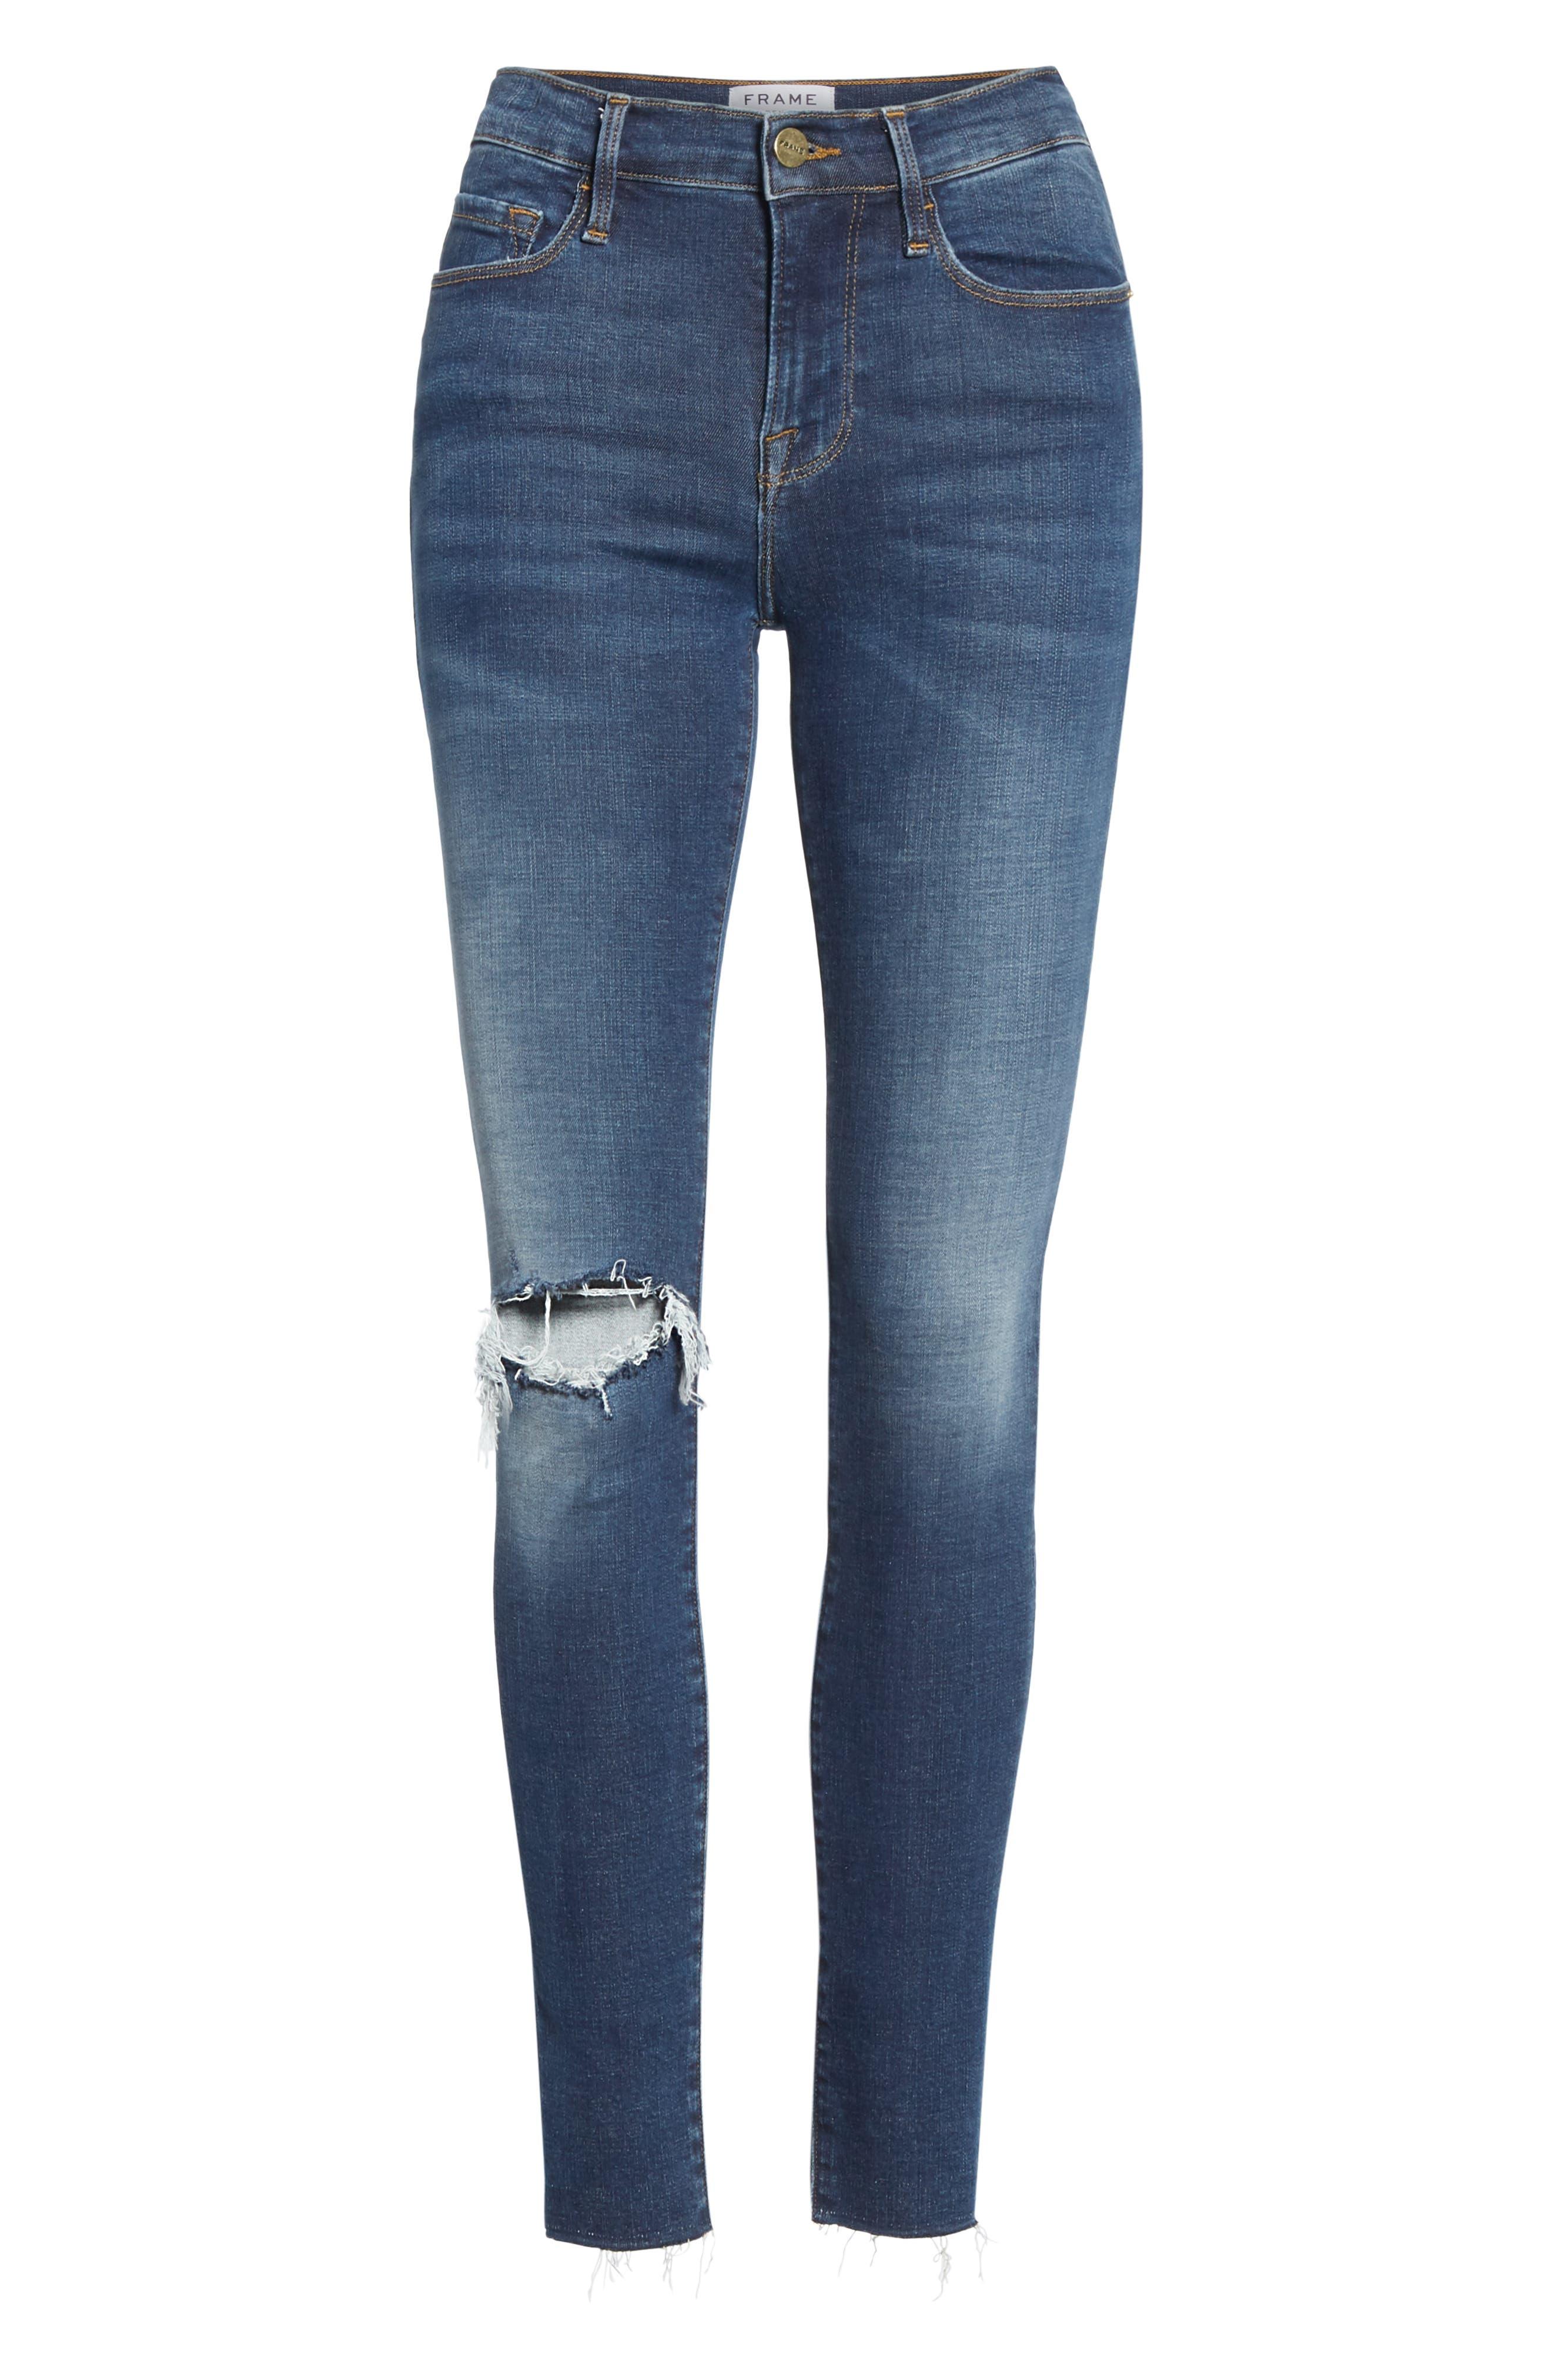 Le Skinny de Jeanne Ripped Raw Hem Ankle Jeans,                             Alternate thumbnail 6, color,                             JOLIE